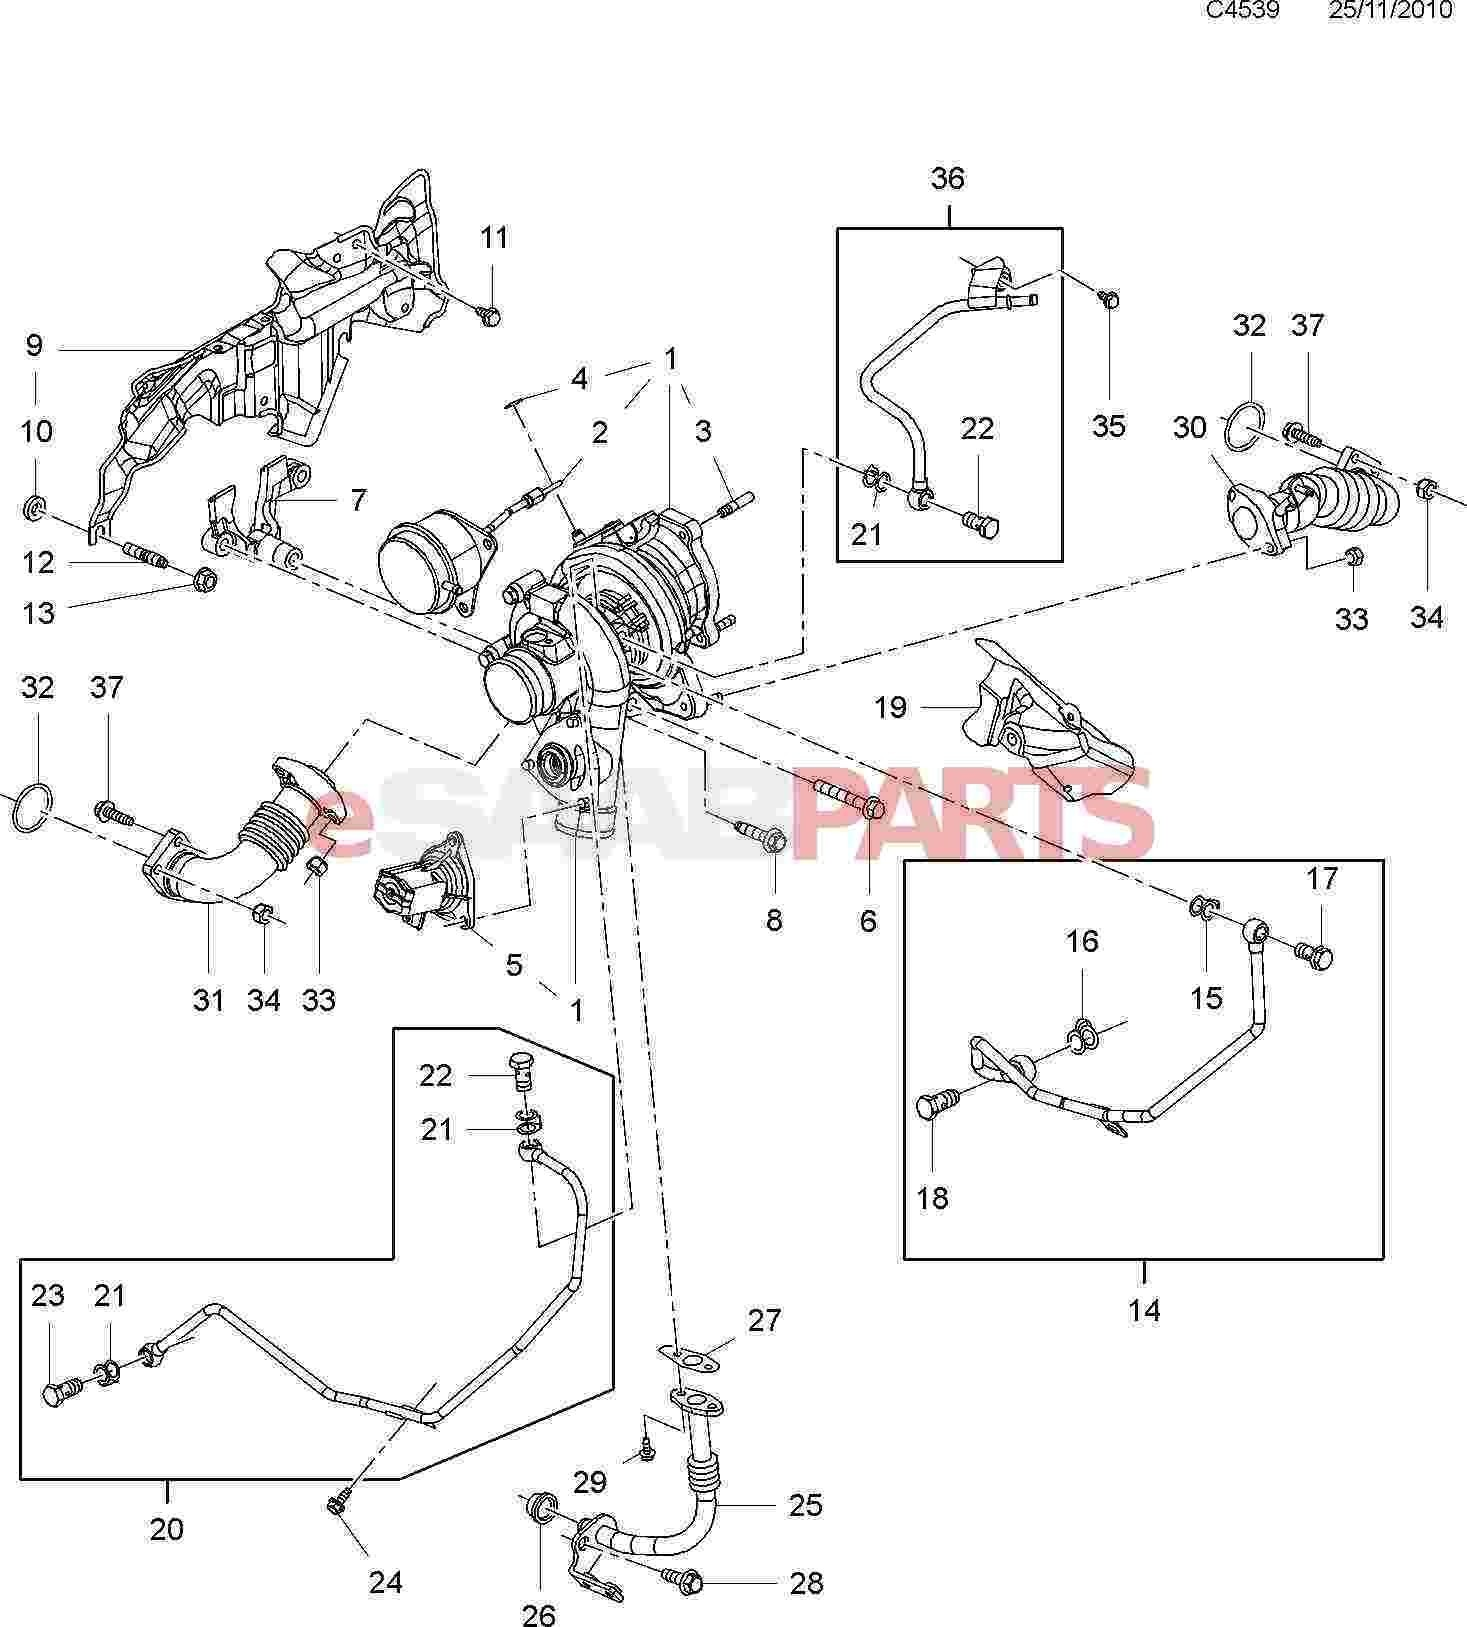 Saab 93 Fuse Box Auto Electrical Wiring Diagram